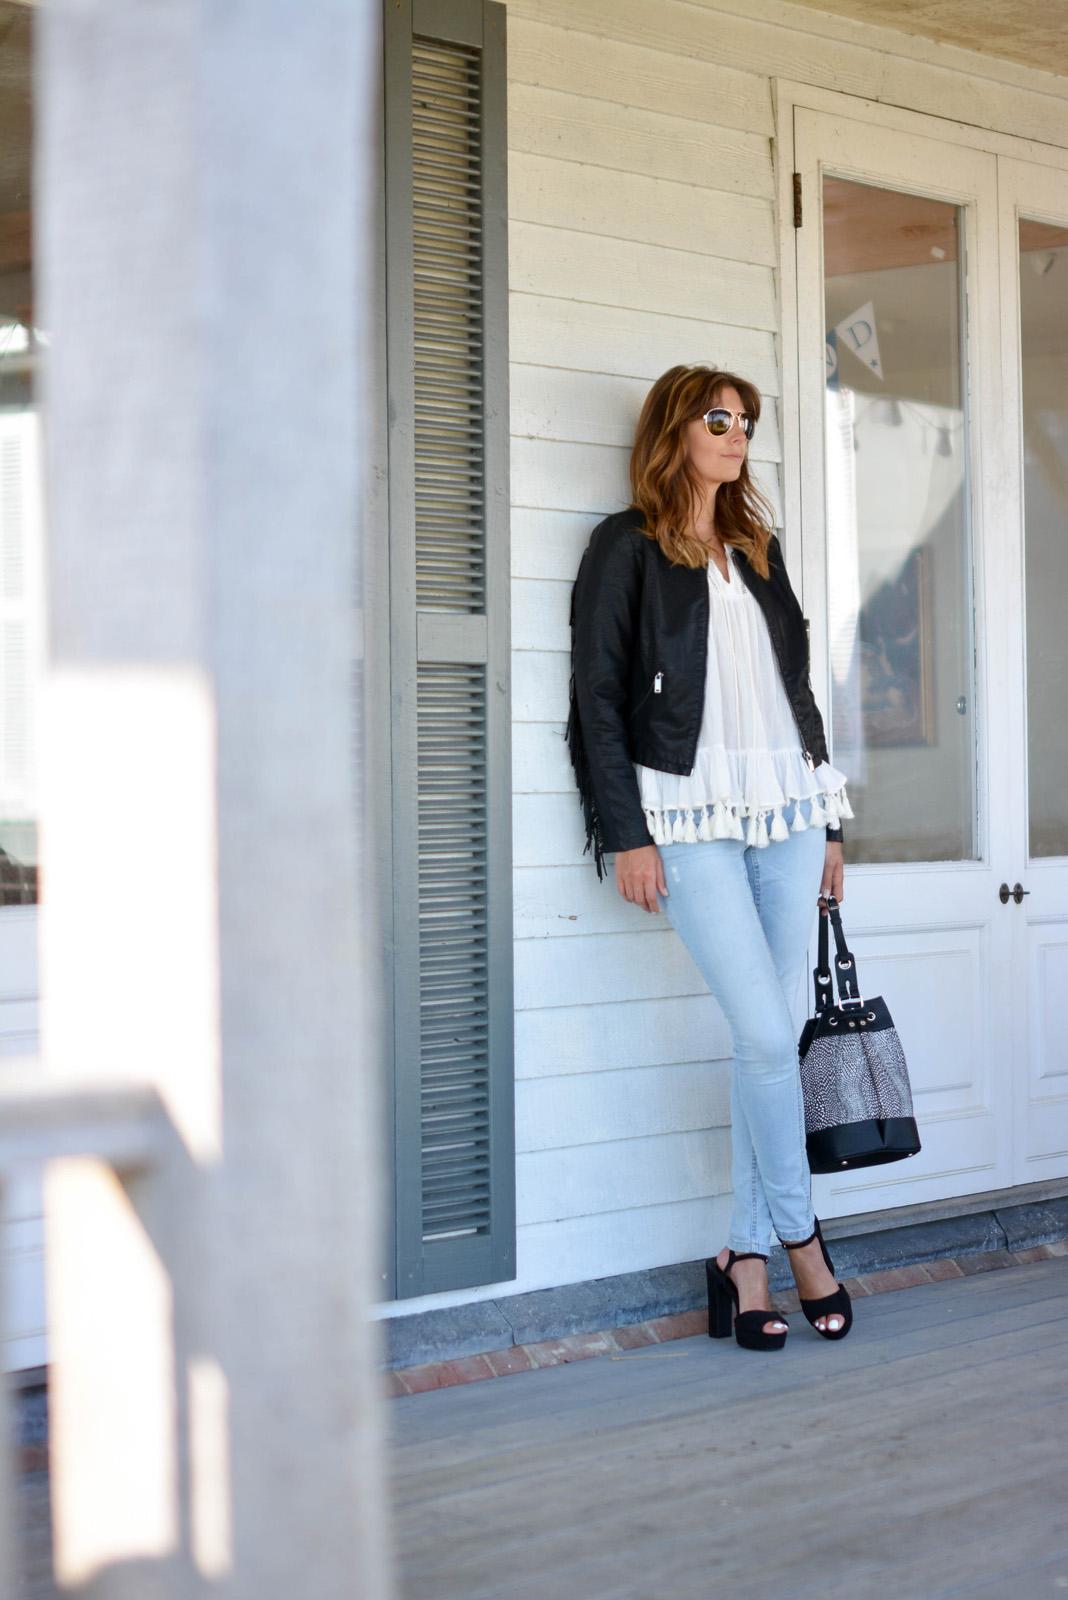 EJSTYLE - Emma Hill wears black tassel fringe leather jacket, tassel trim tunic top, bleach wash skinny jeans, black suede platform sandals, black grey snake bucket bag, aviator sunglasses, OOTD